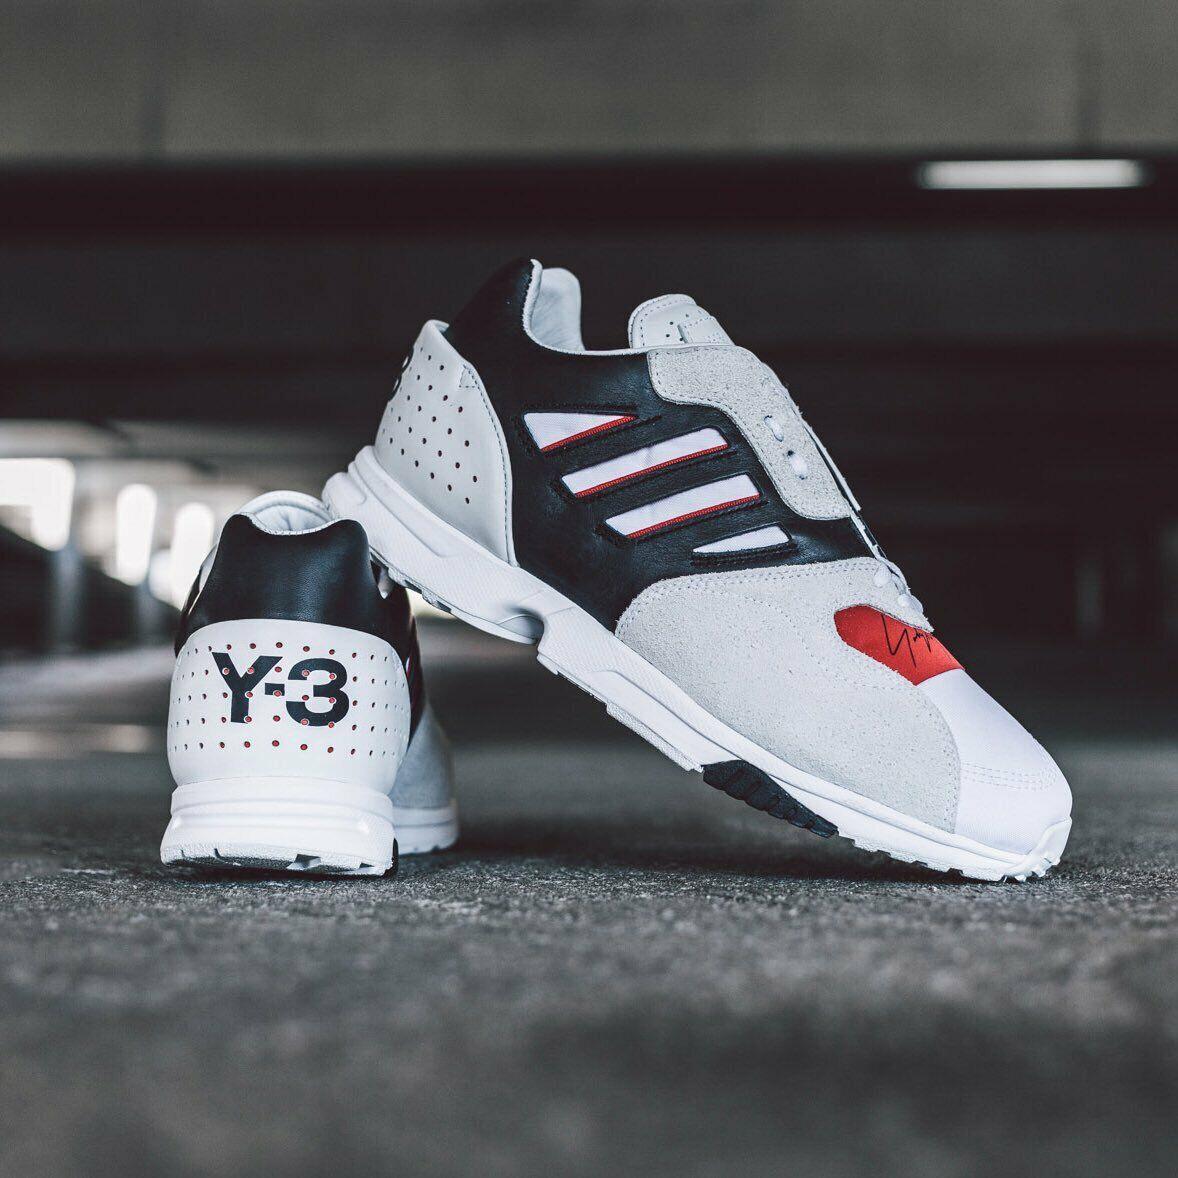 Adidas Y3 Zx Run Trainers UK5 Yohji Yamamoto's Y-3 1000 C 4000 originals ADV TR